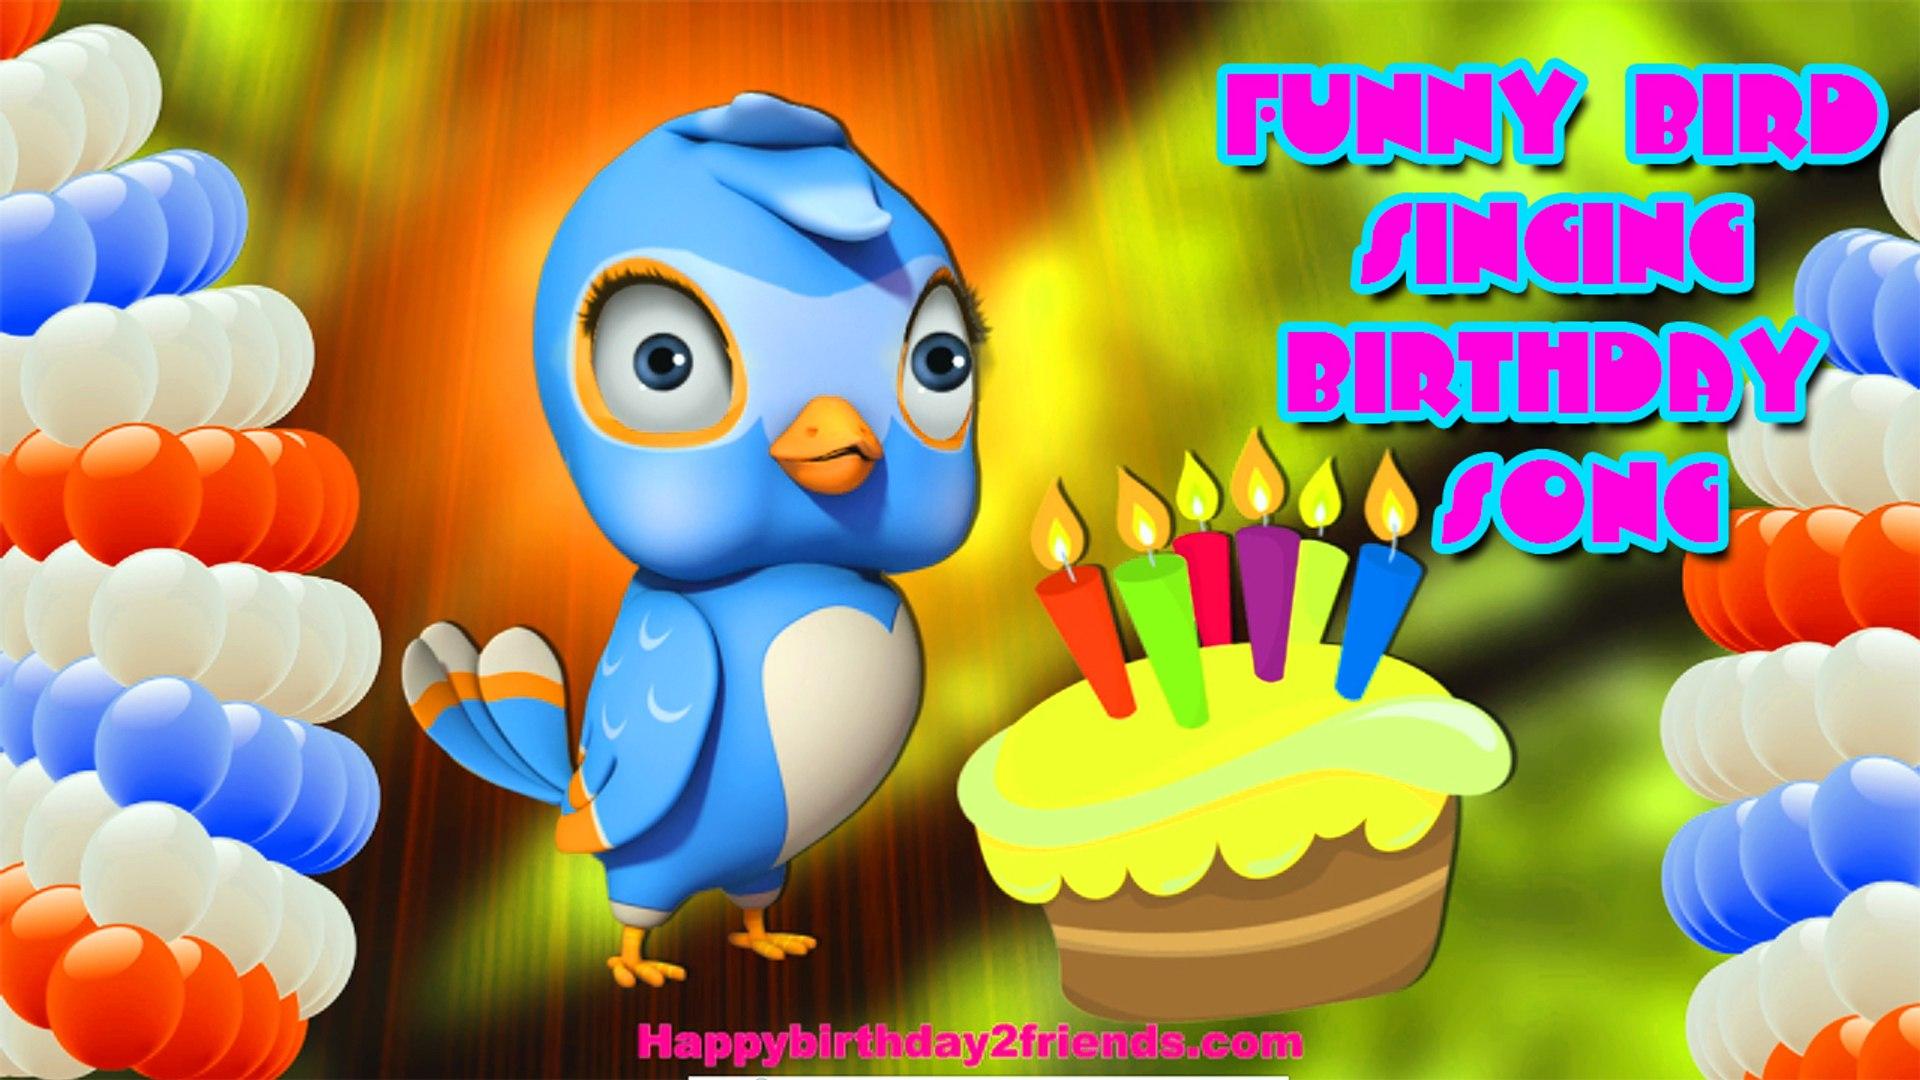 Best Happy Birthday Song Funny Bird Singing Birthday Song Video Dailymotion